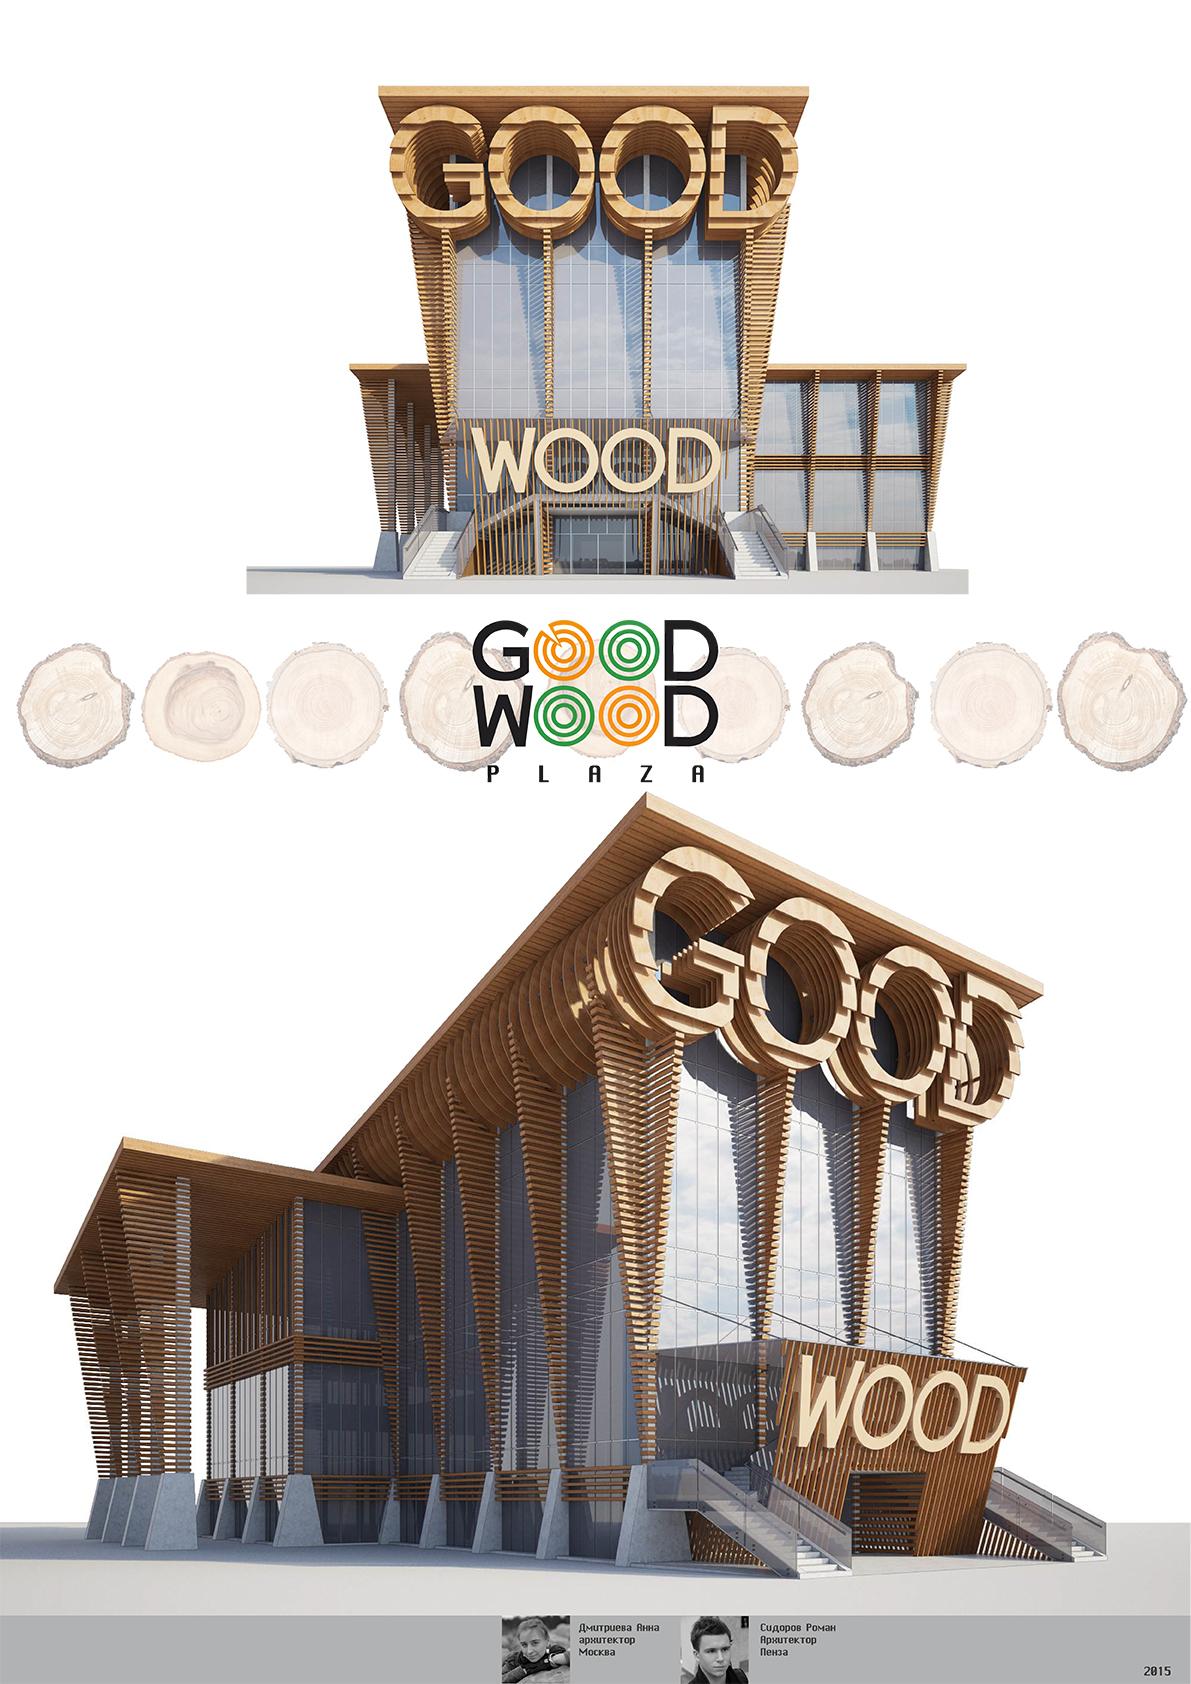 конкурсный проект GoodWood_Plaza